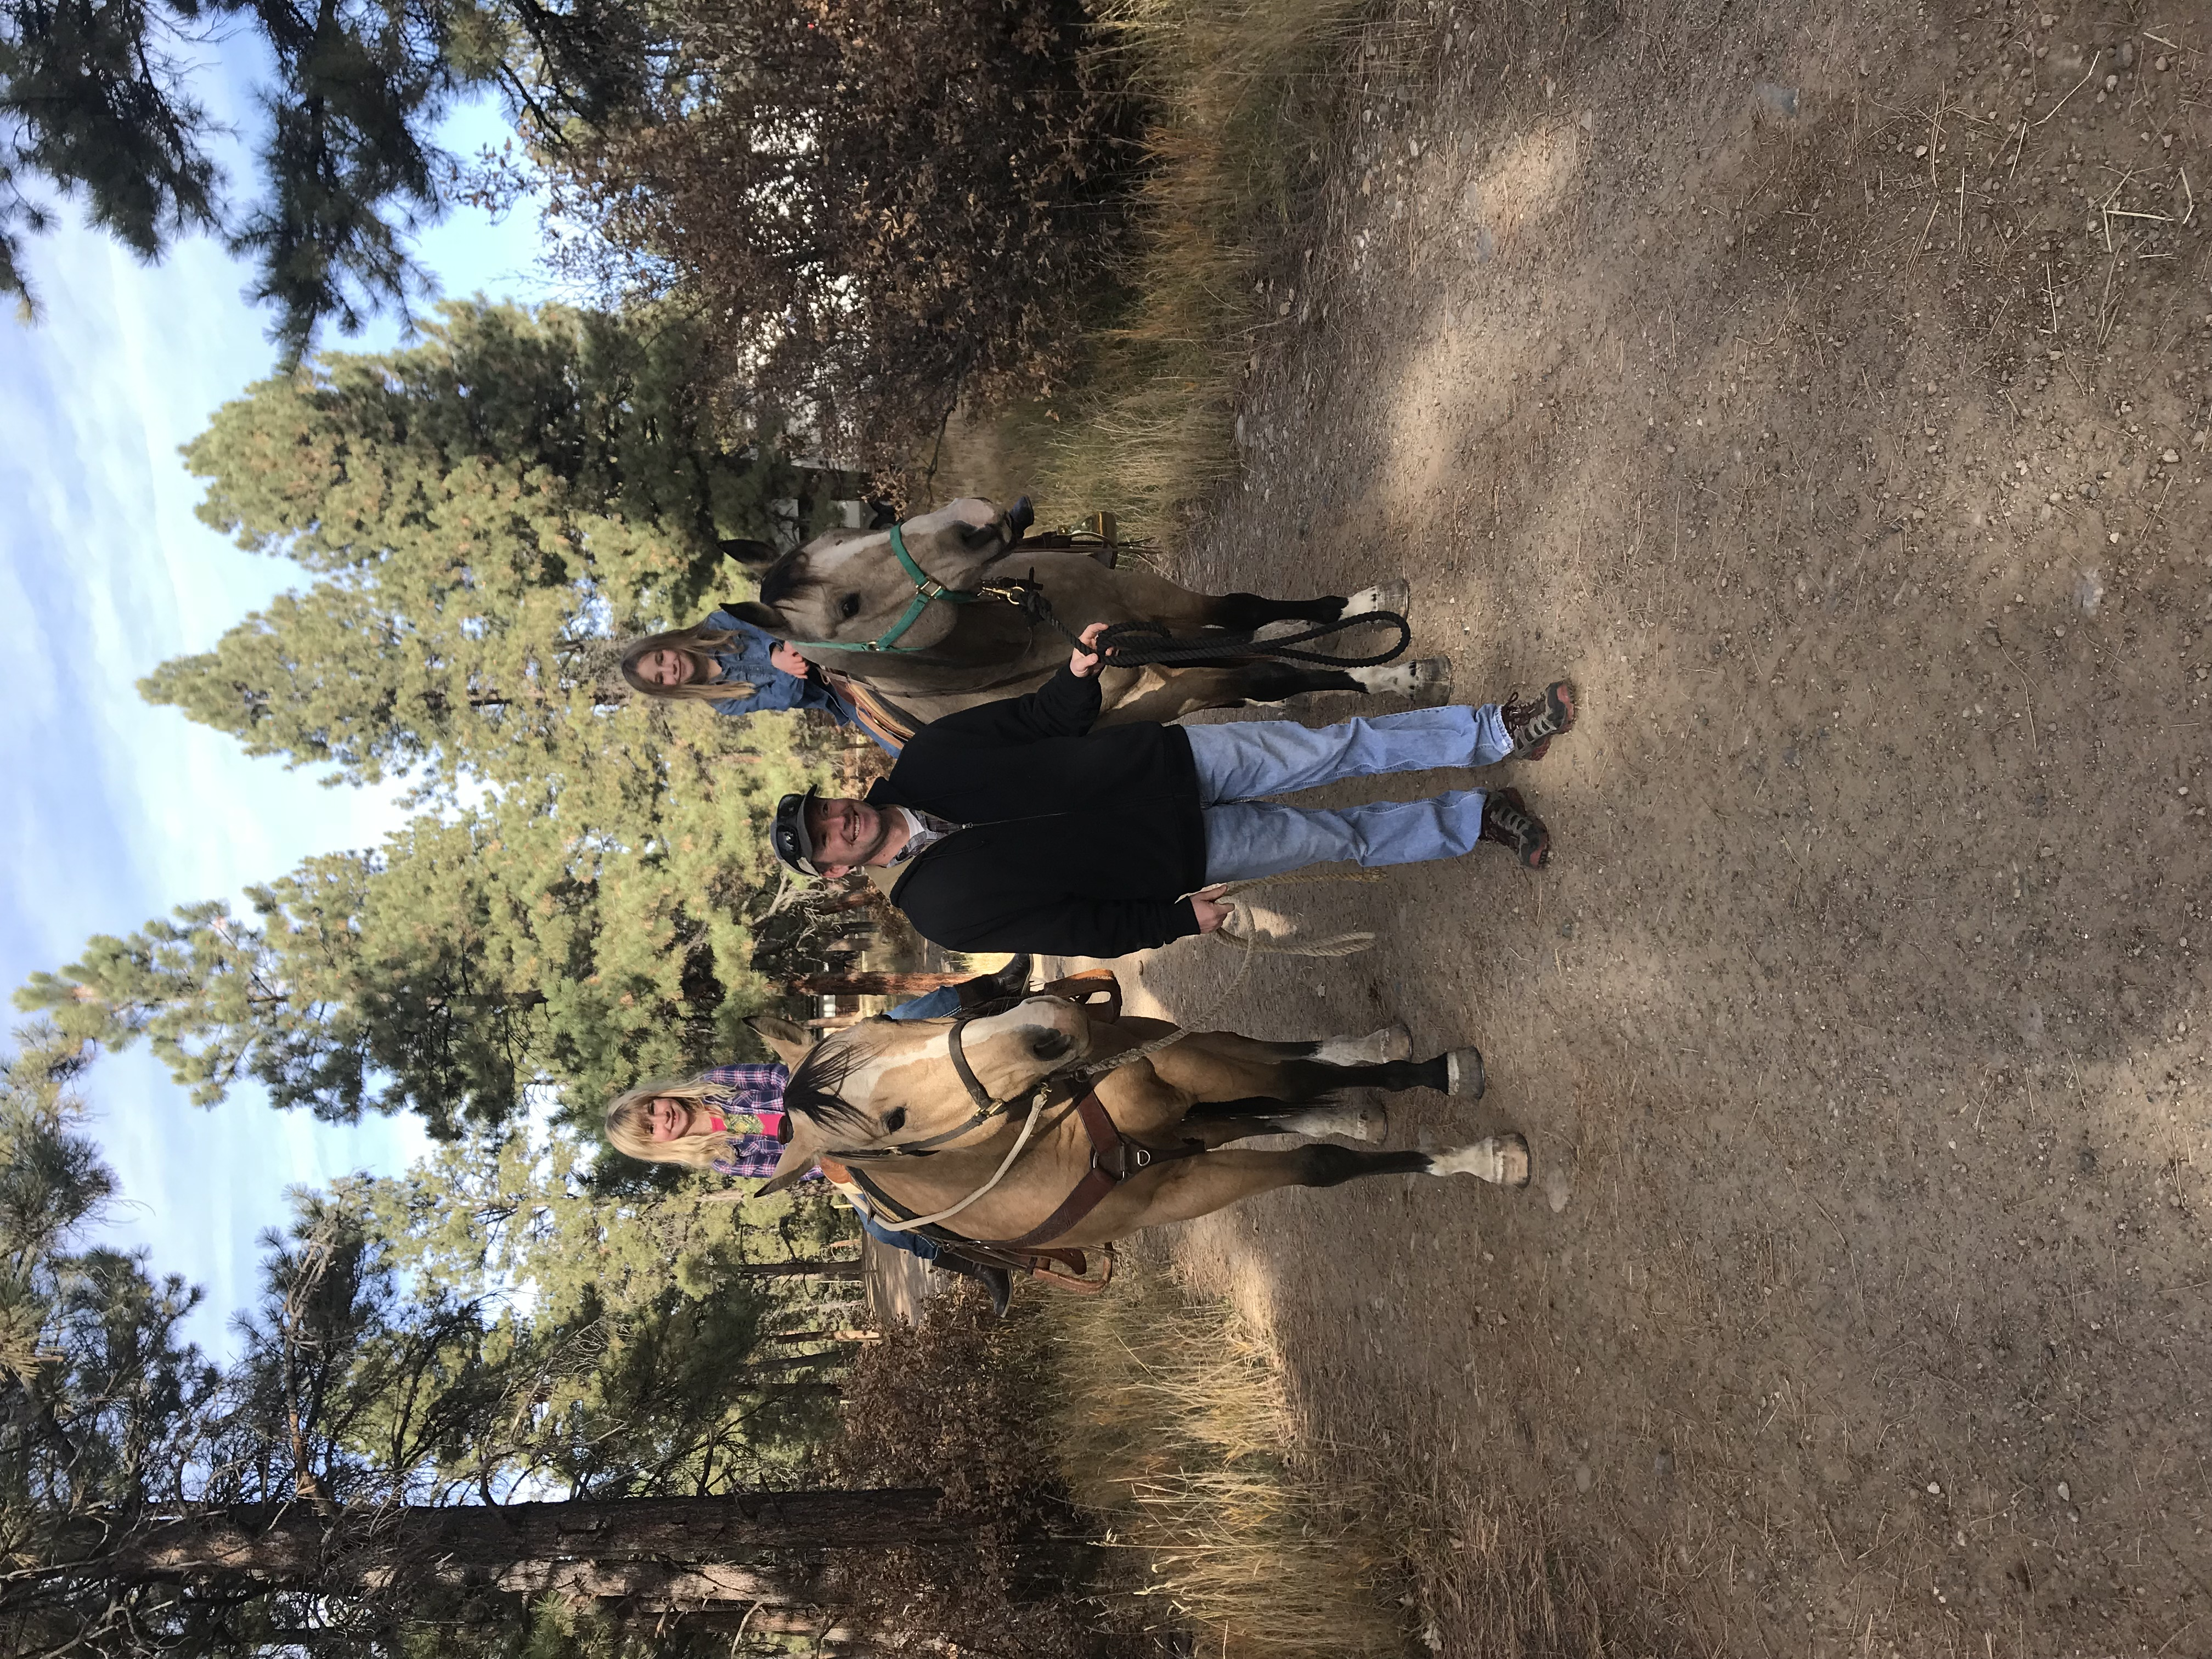 Trail ride at Sauls Creek Stables